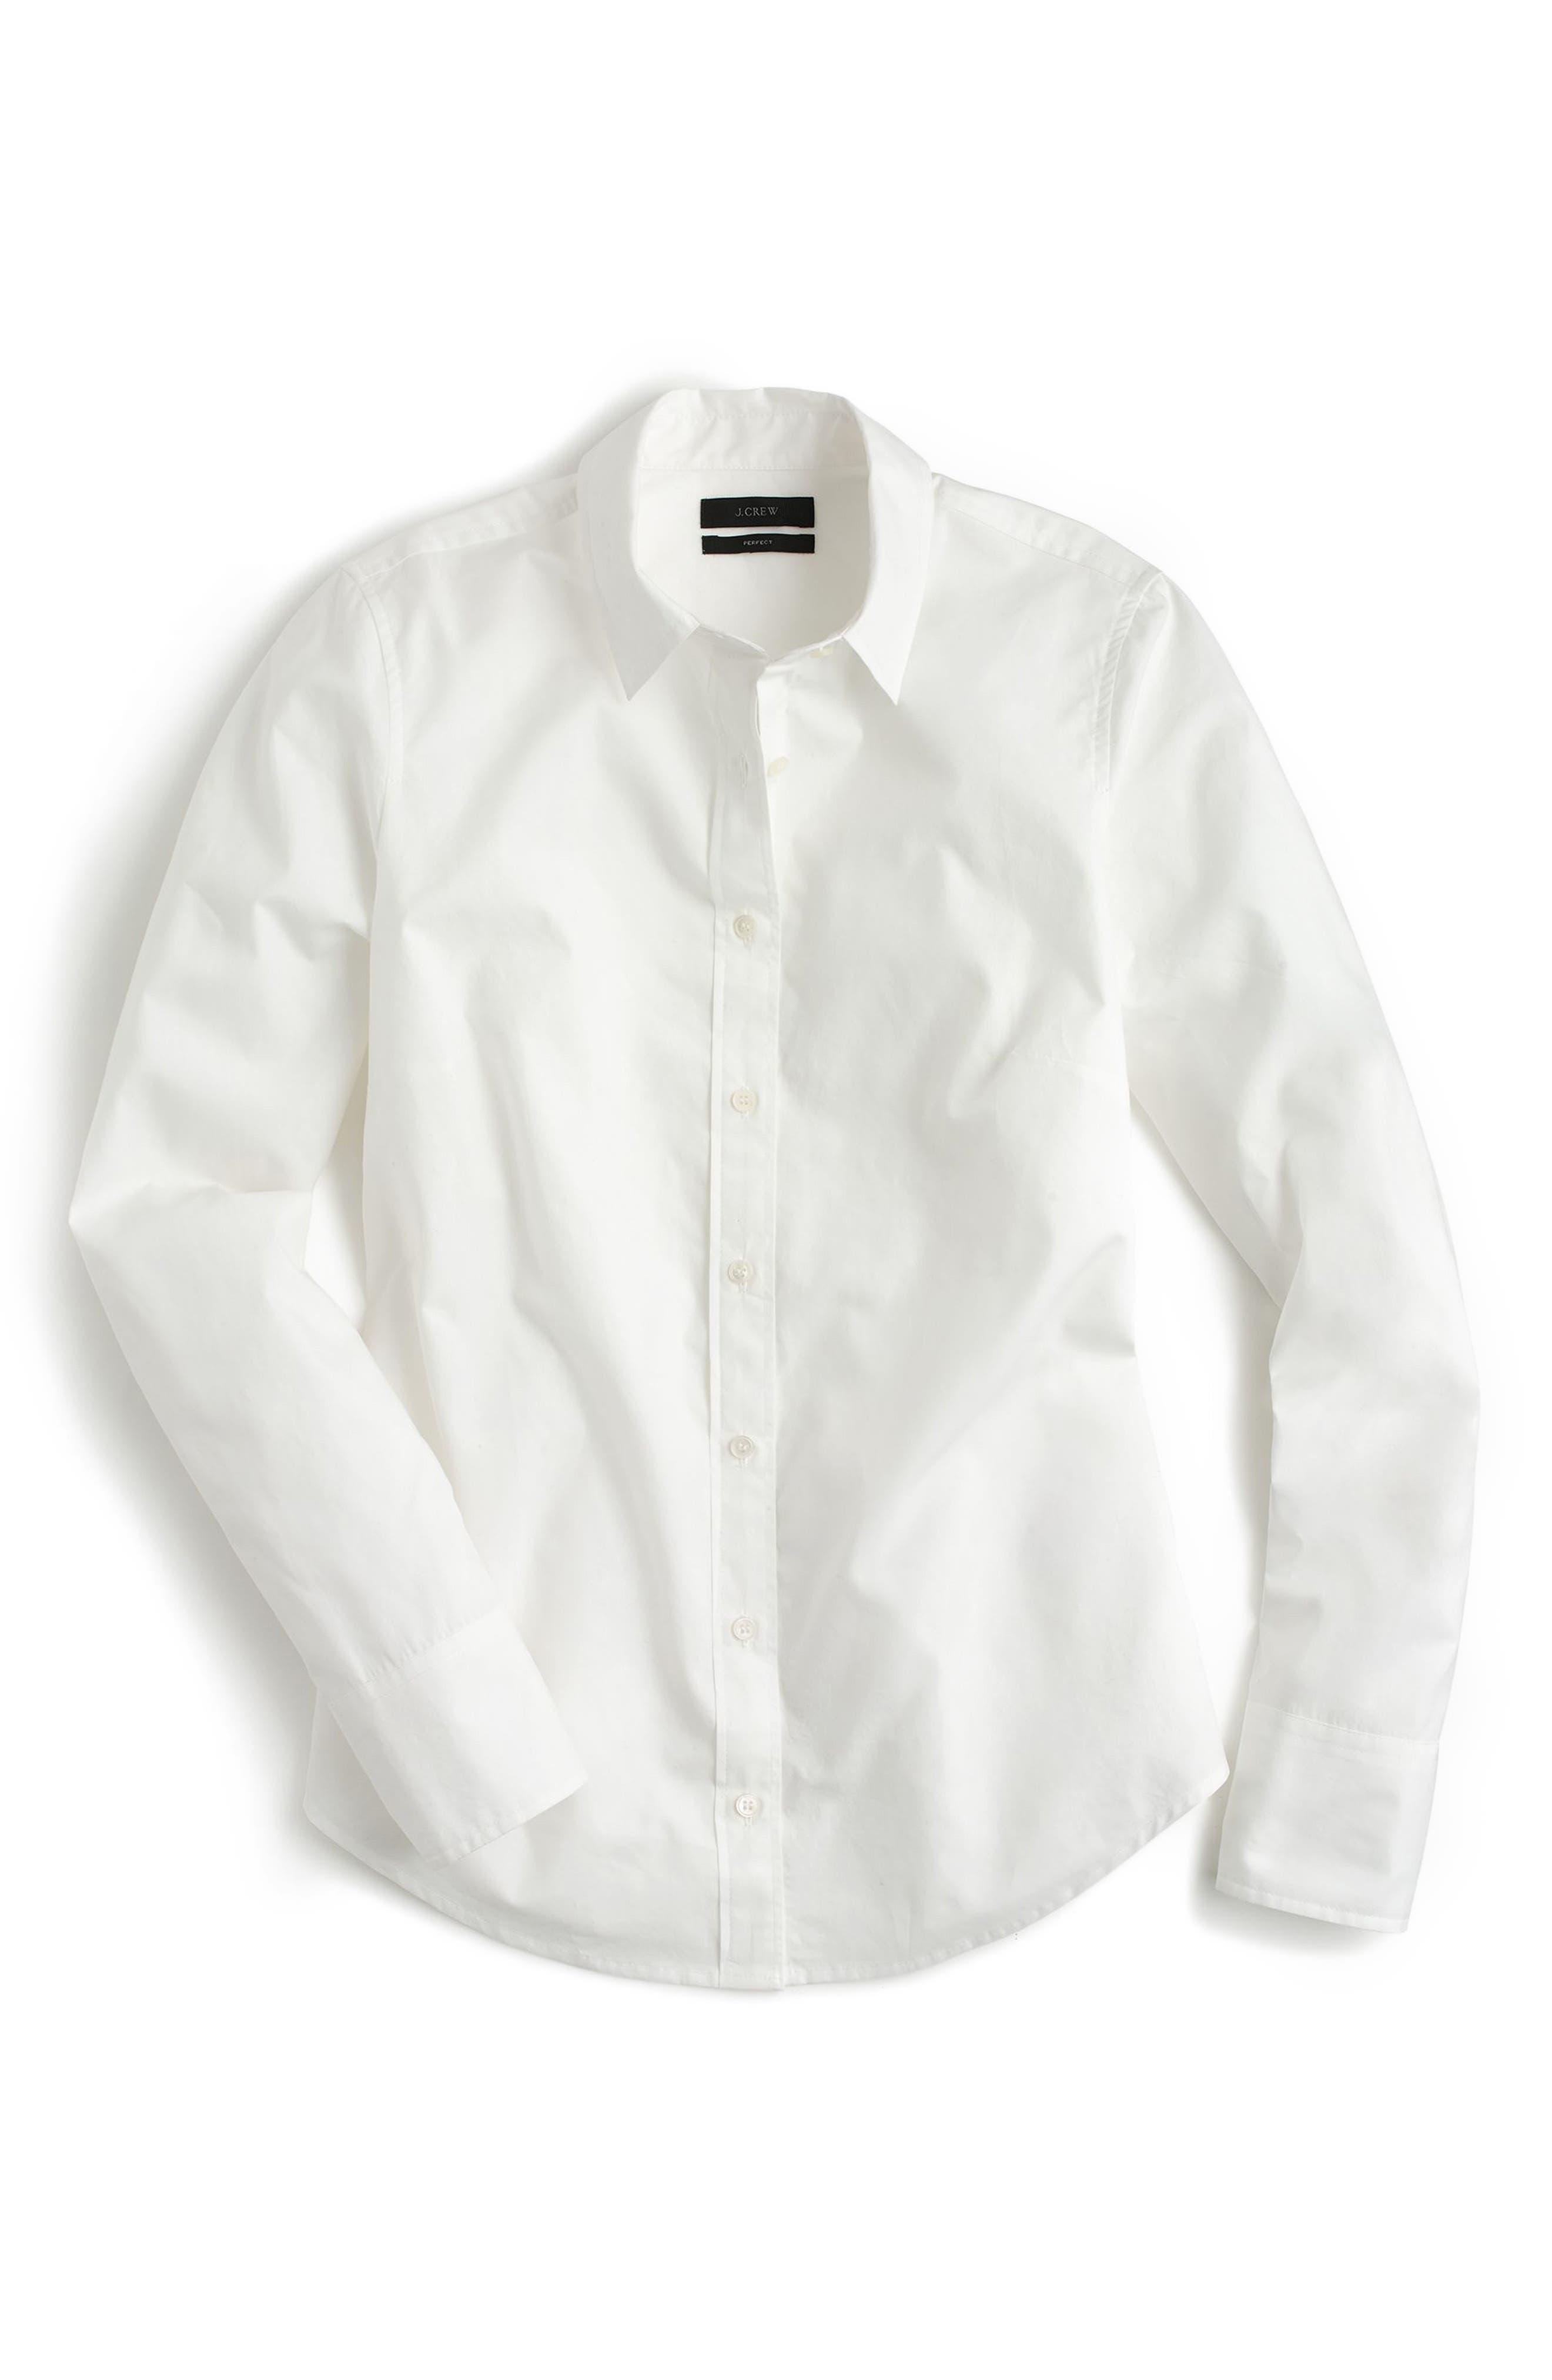 J.Crew New Perfect Cotton Poplin Shirt,                             Alternate thumbnail 3, color,                             White